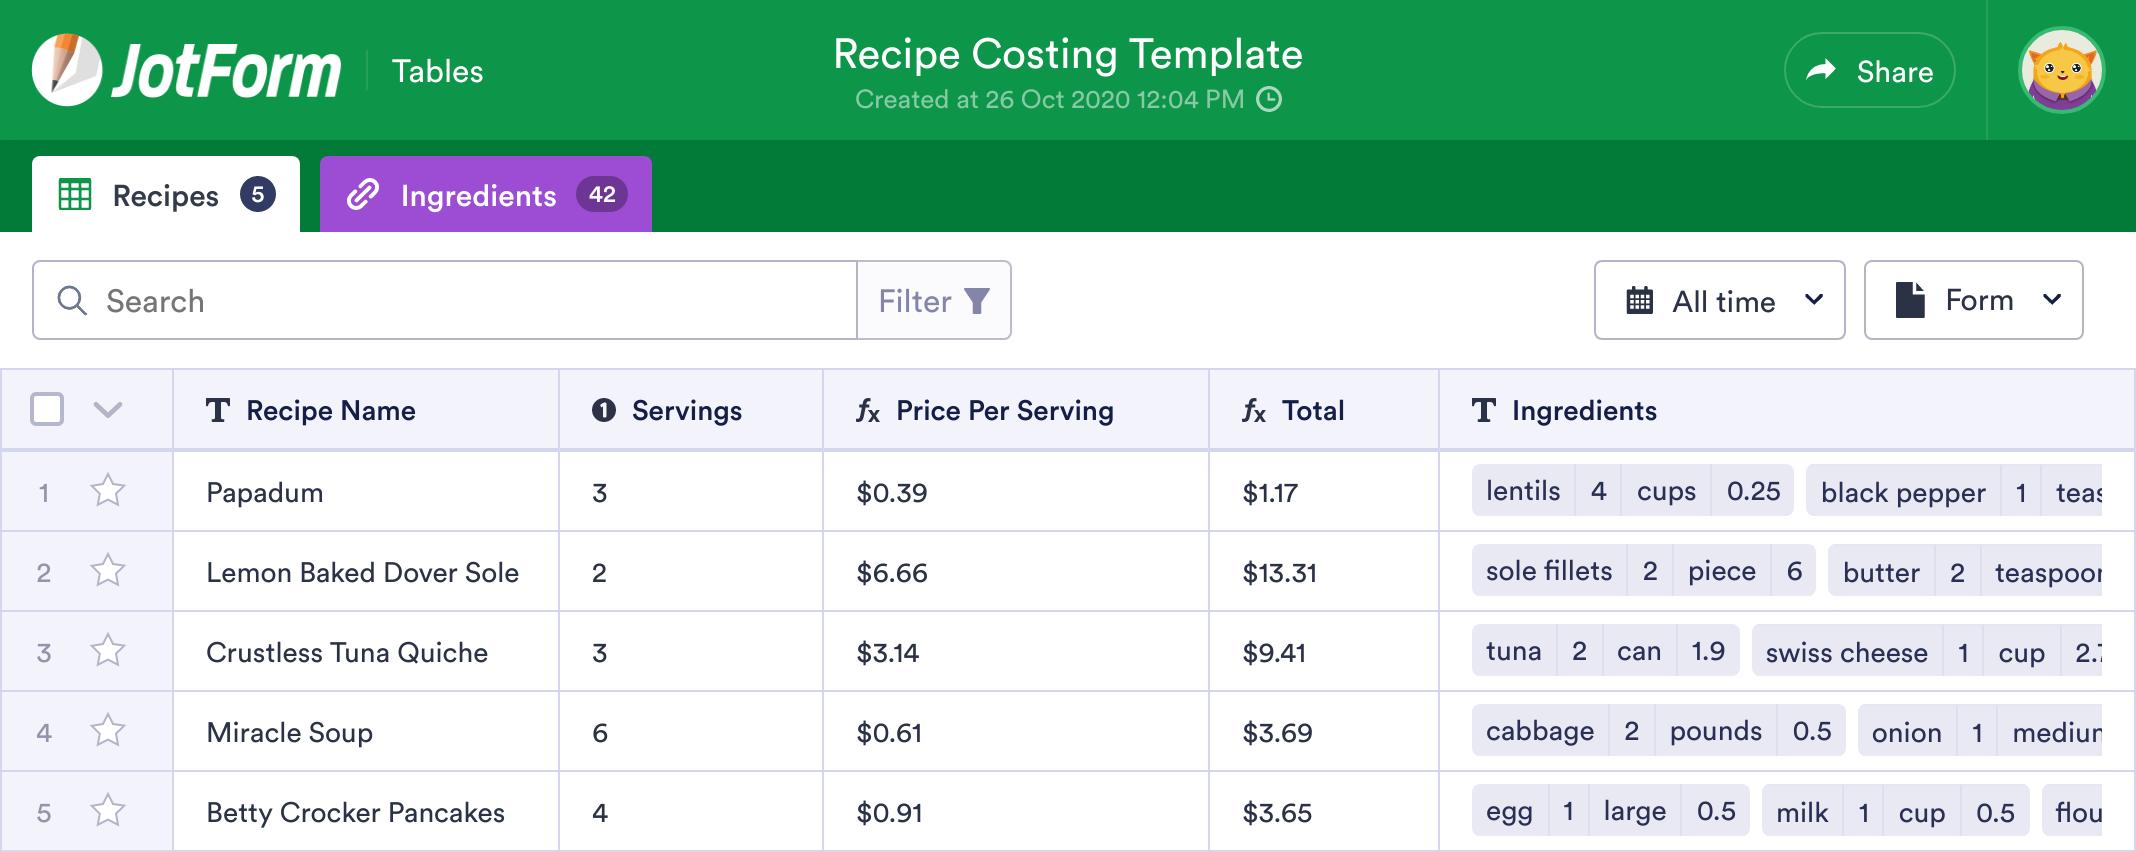 Recipe Costing Template